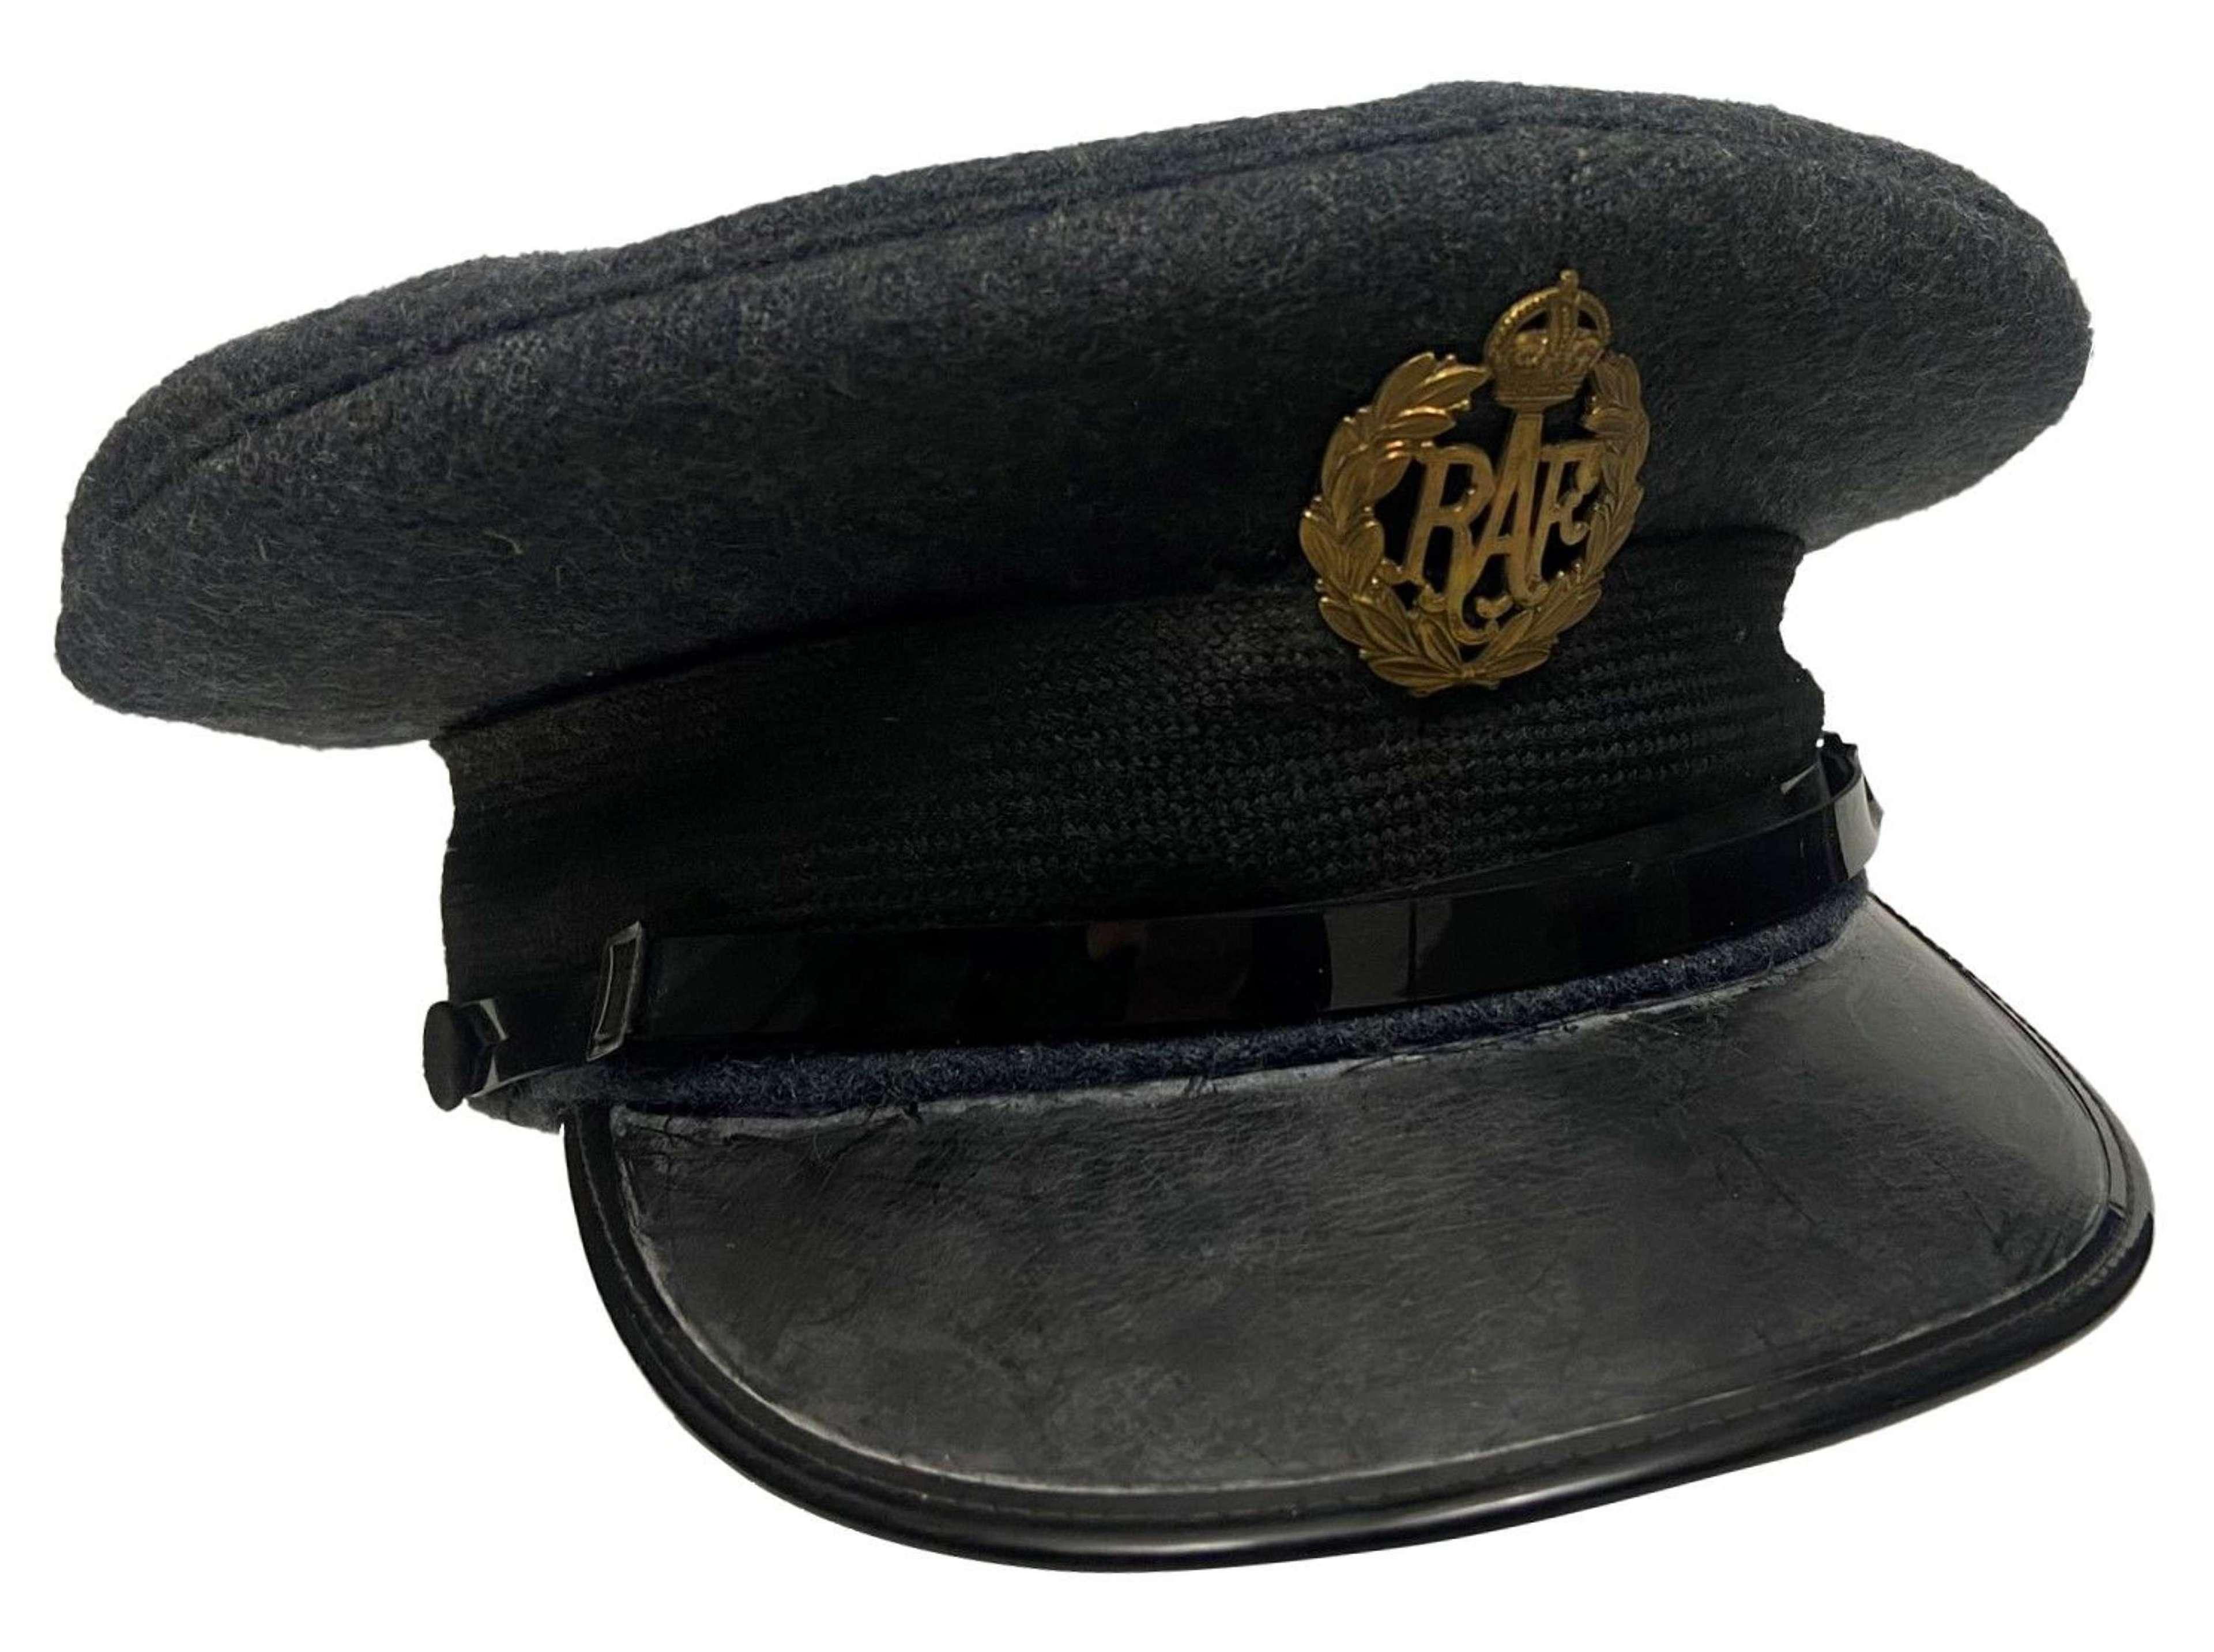 Original 1954 Dated RAF Ordinary Airman's Peaked Cap